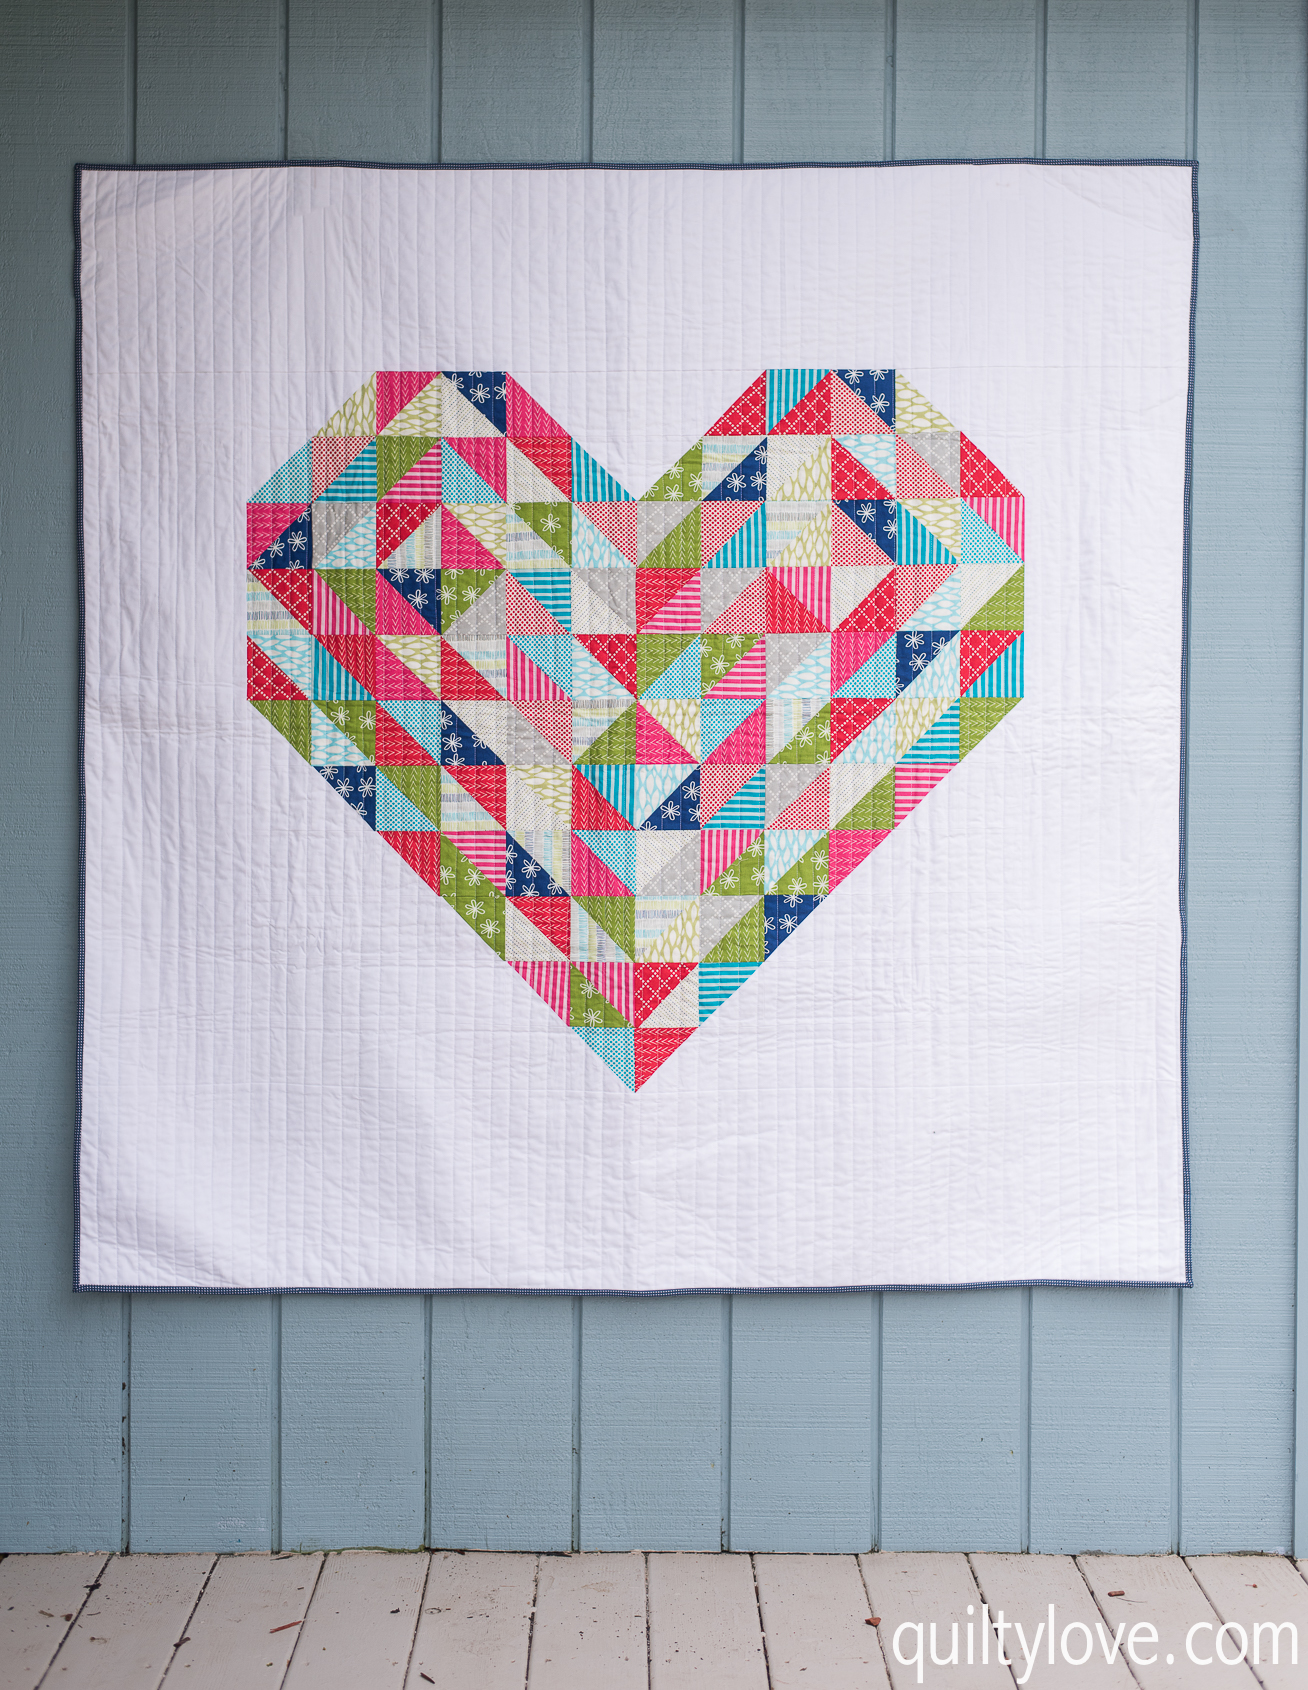 heart quilt_quiltylove